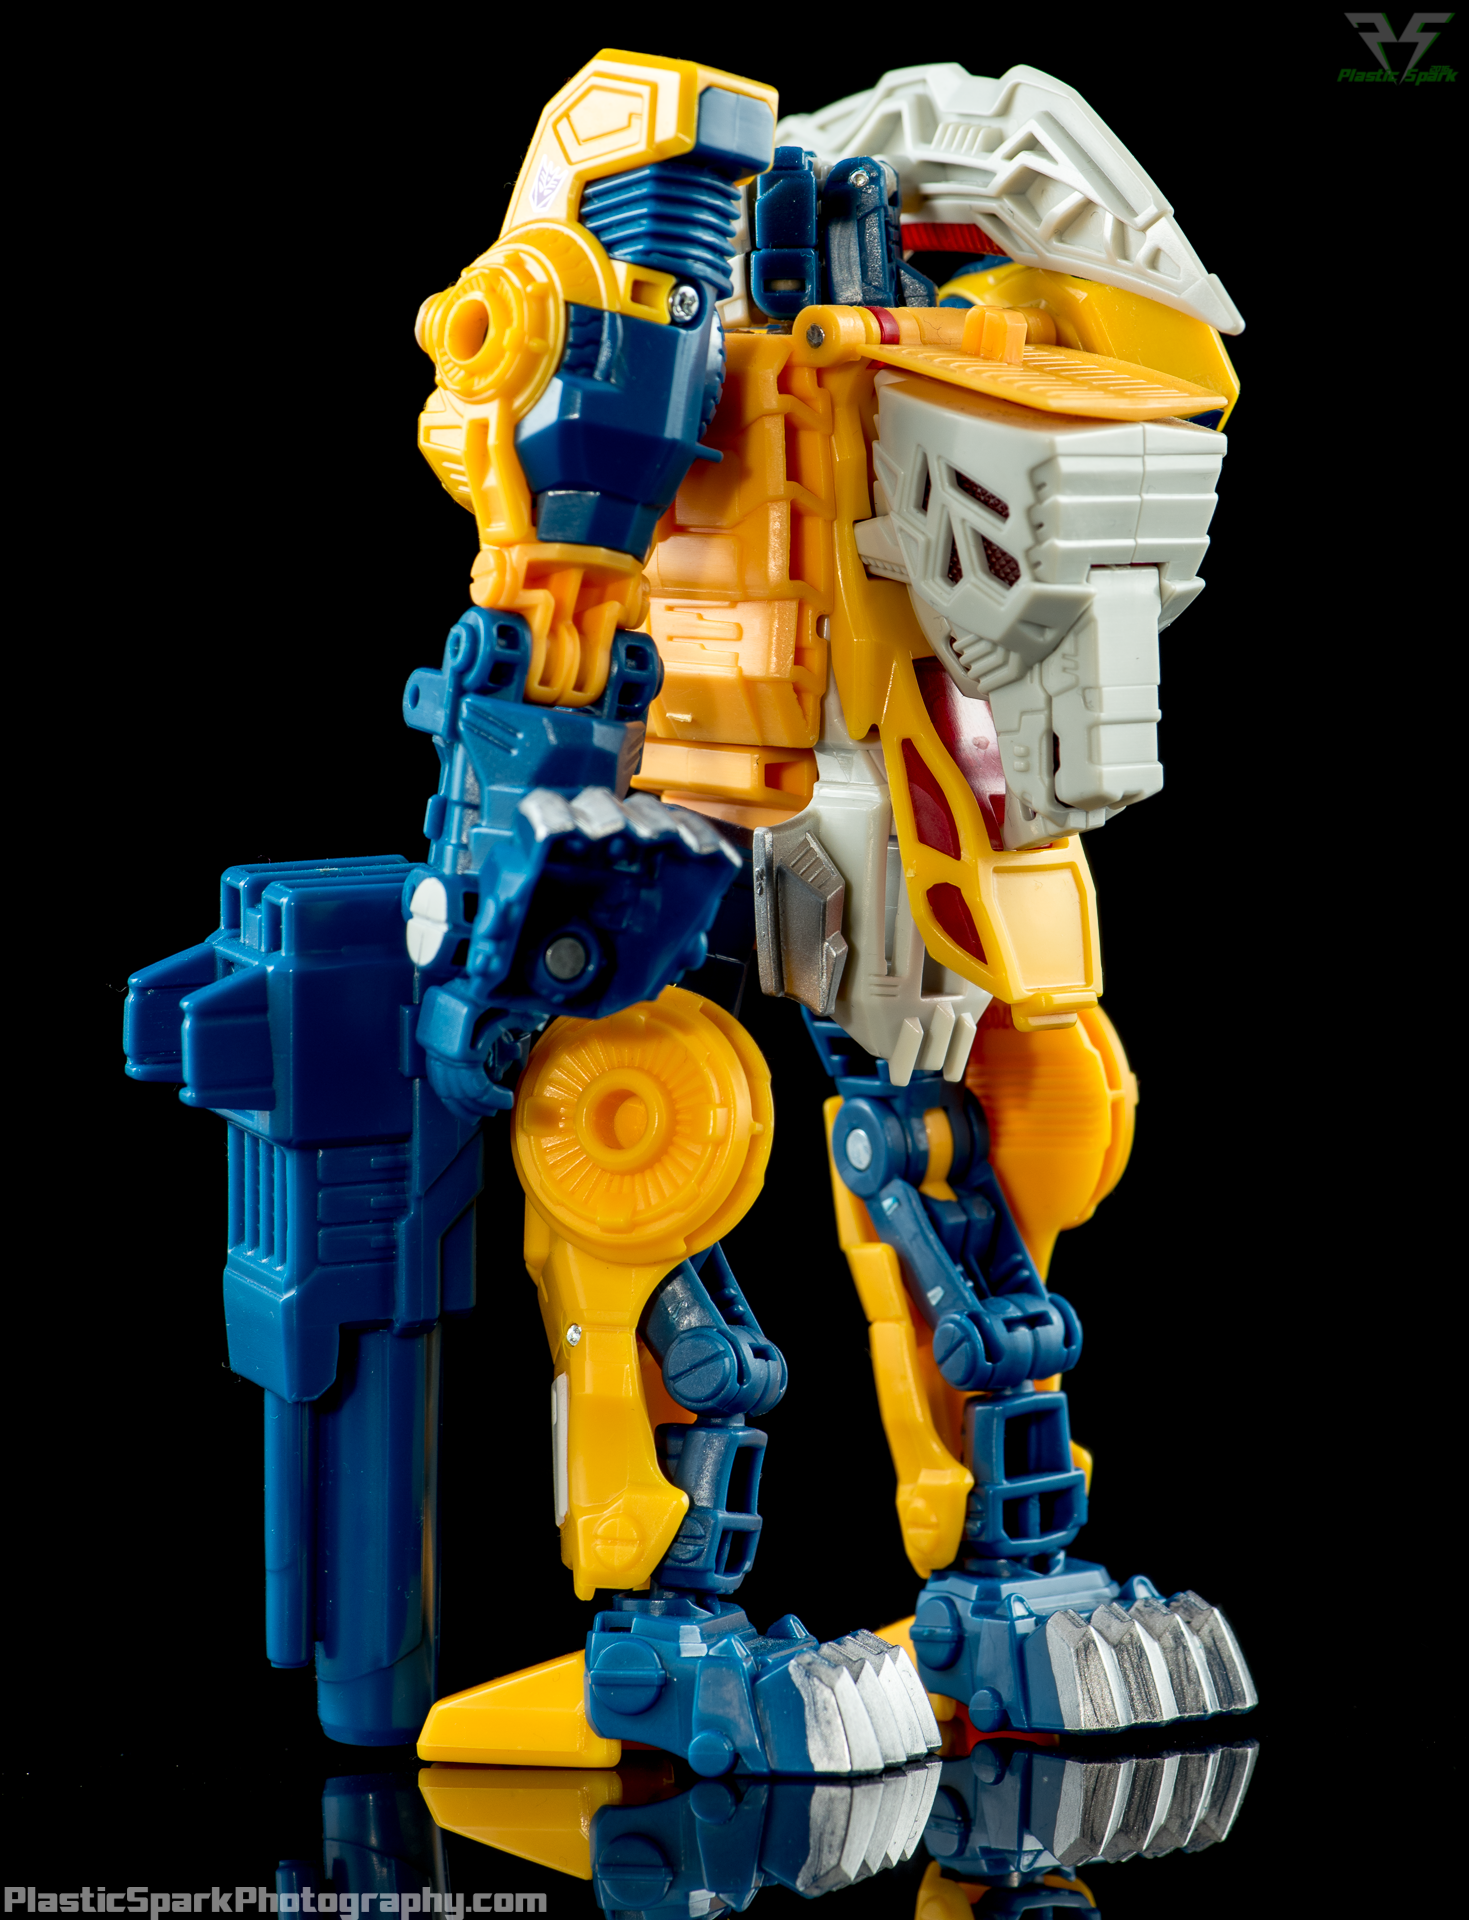 Titans-Return-Weirdwolf-(2-of-11).png